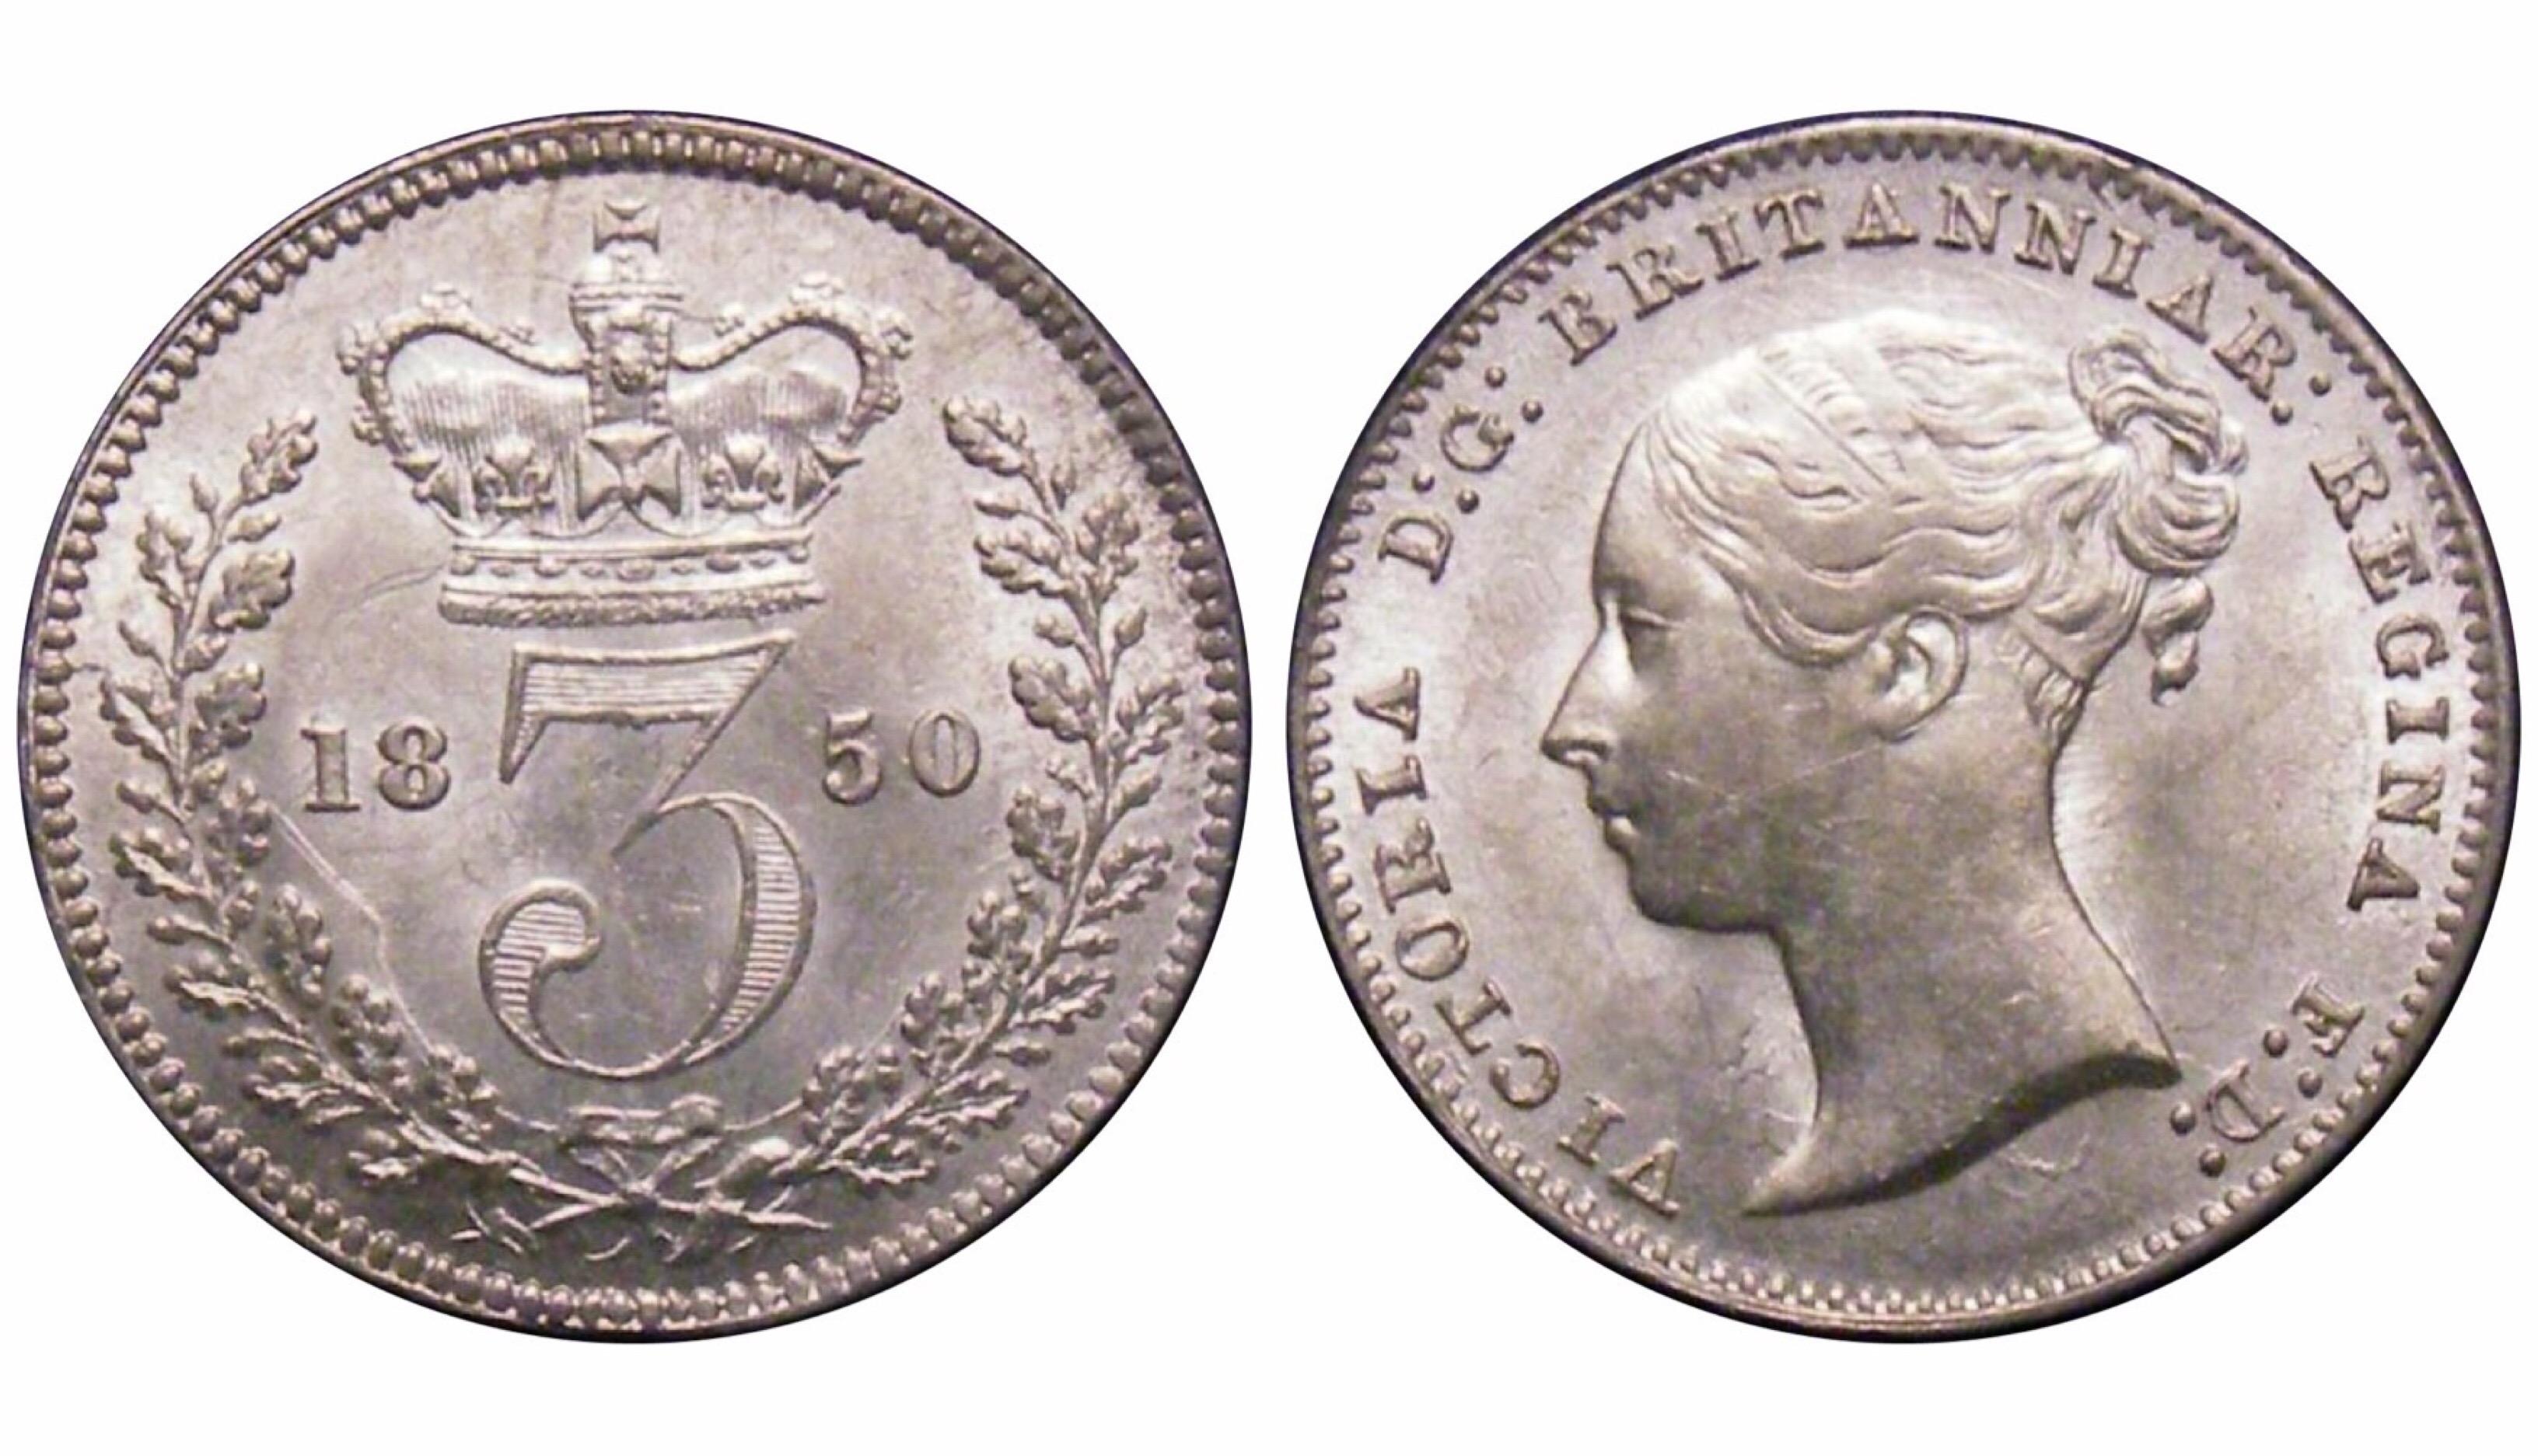 1850 Threepence, CGS 60(AU 58- MS 60), EF, Victoria, ESC 2058